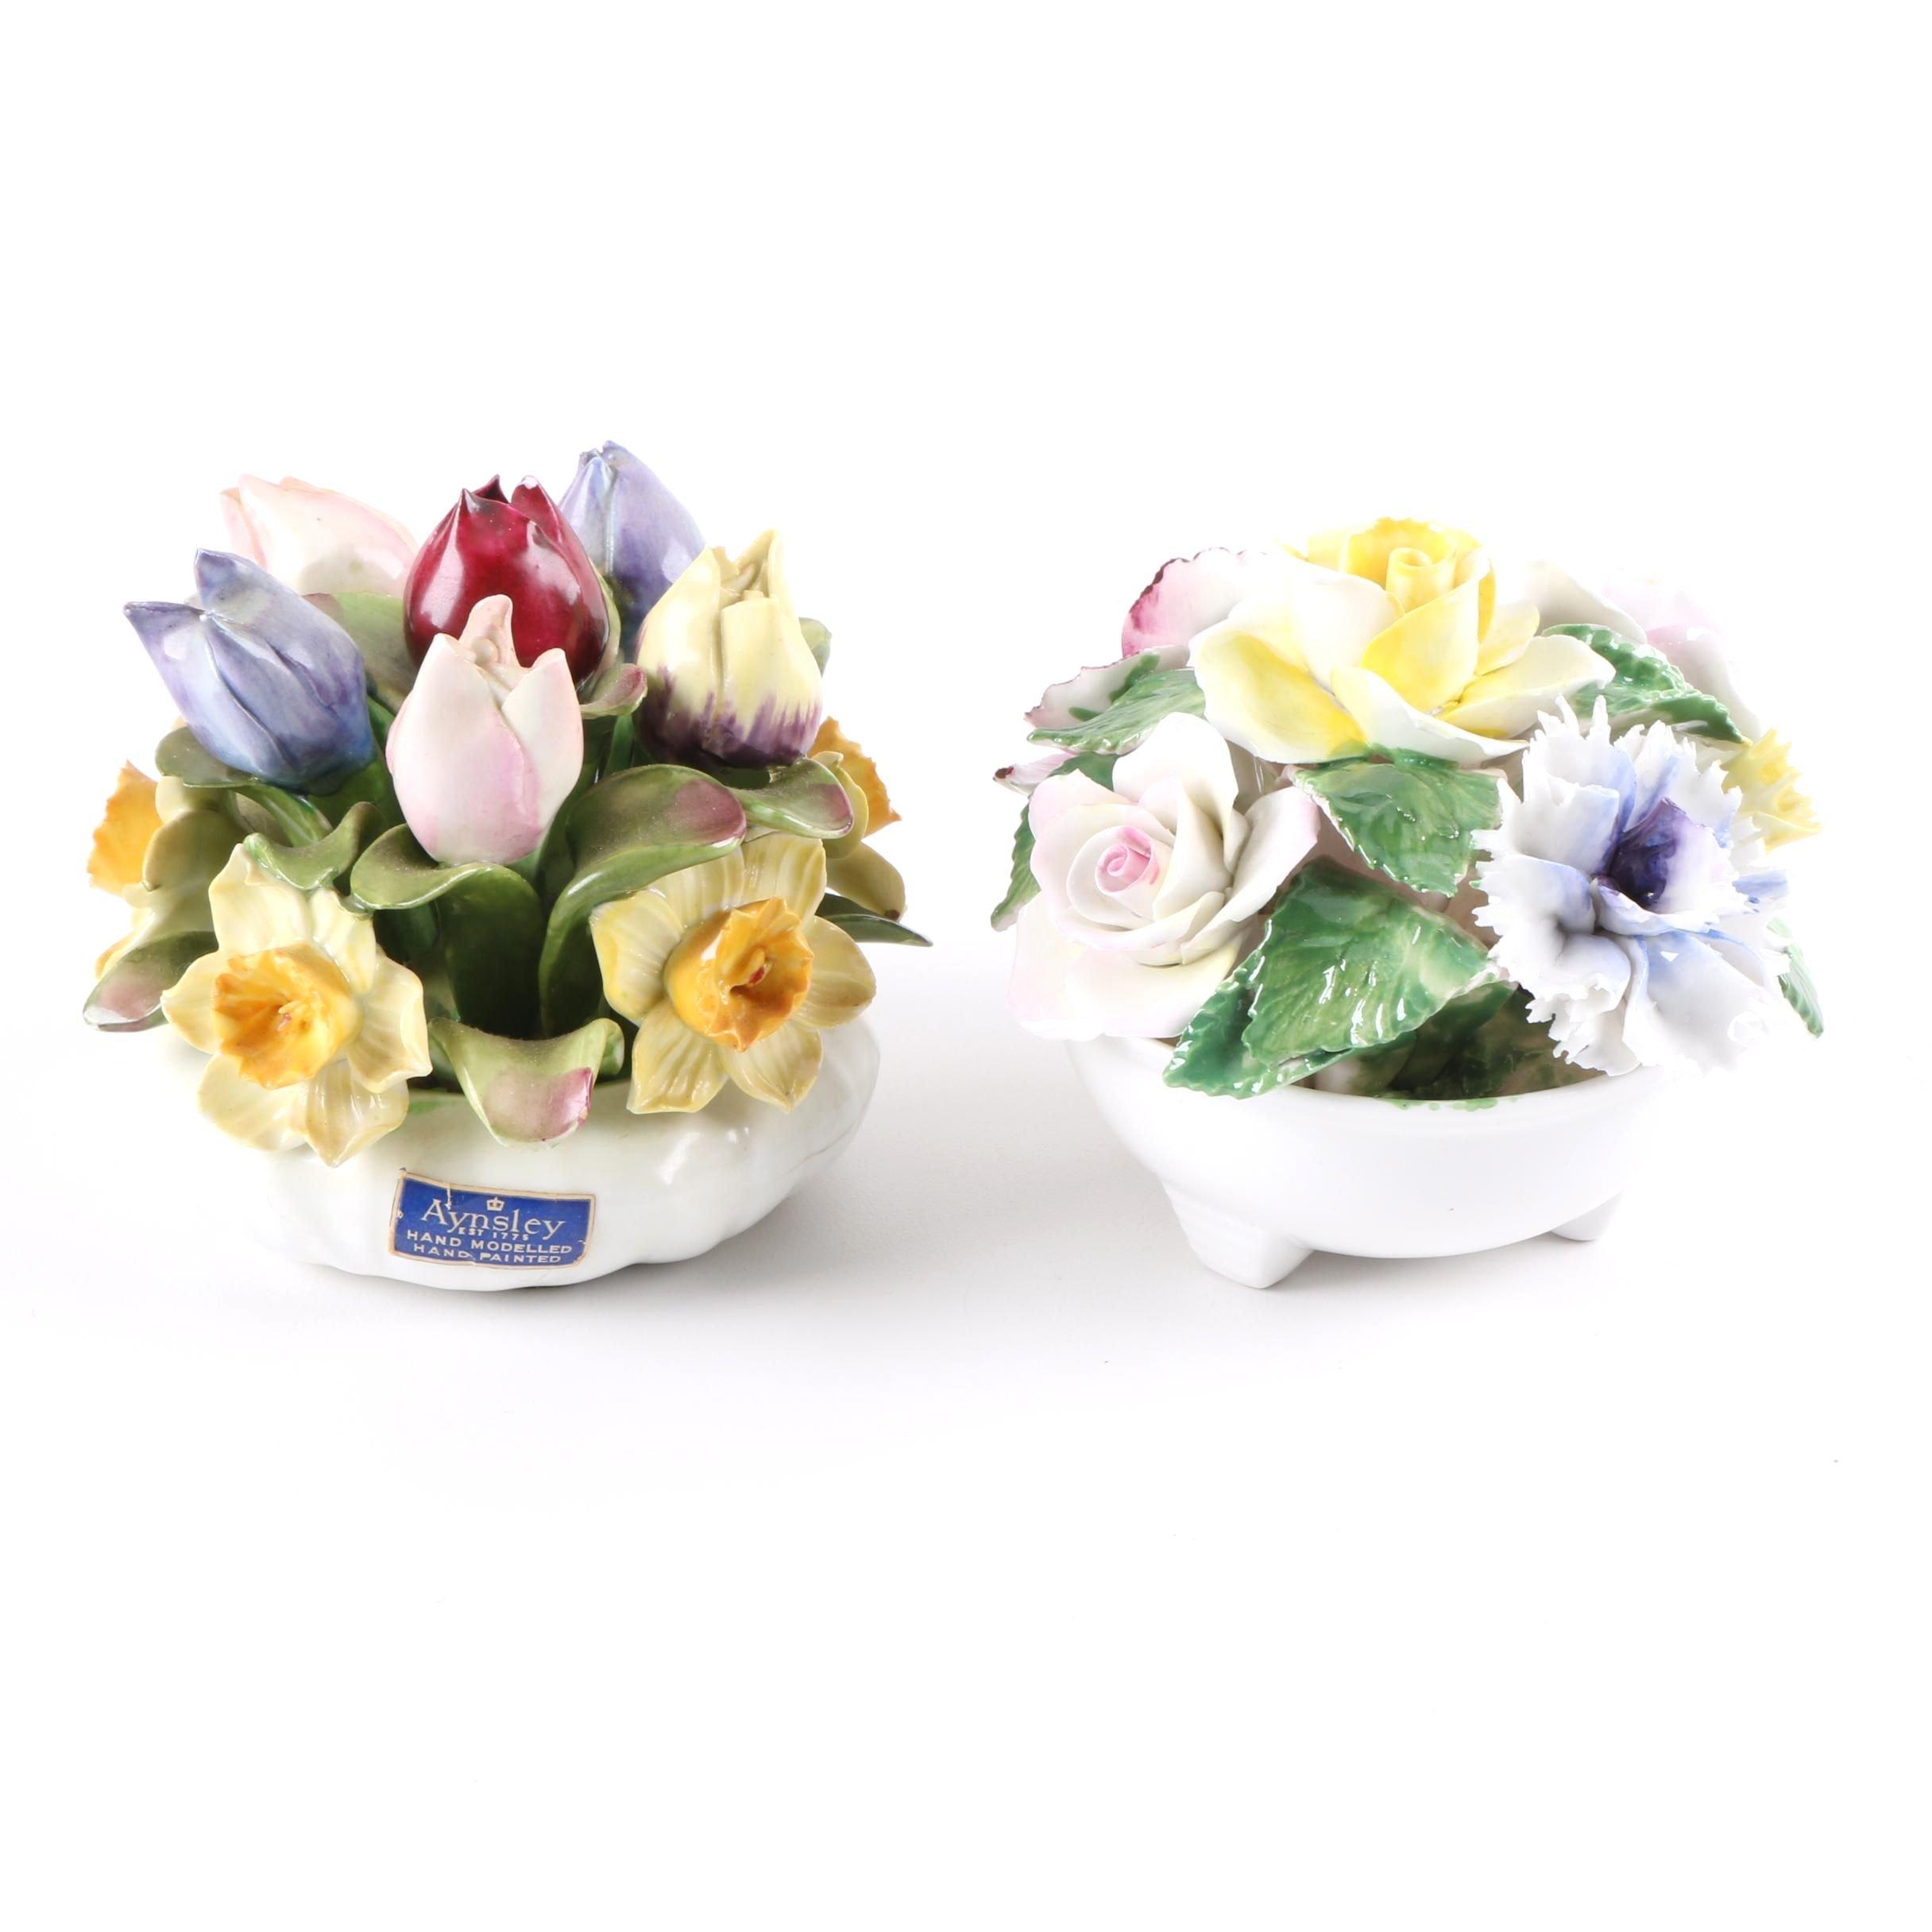 Aynsley and Kew Royal Floral Figurines